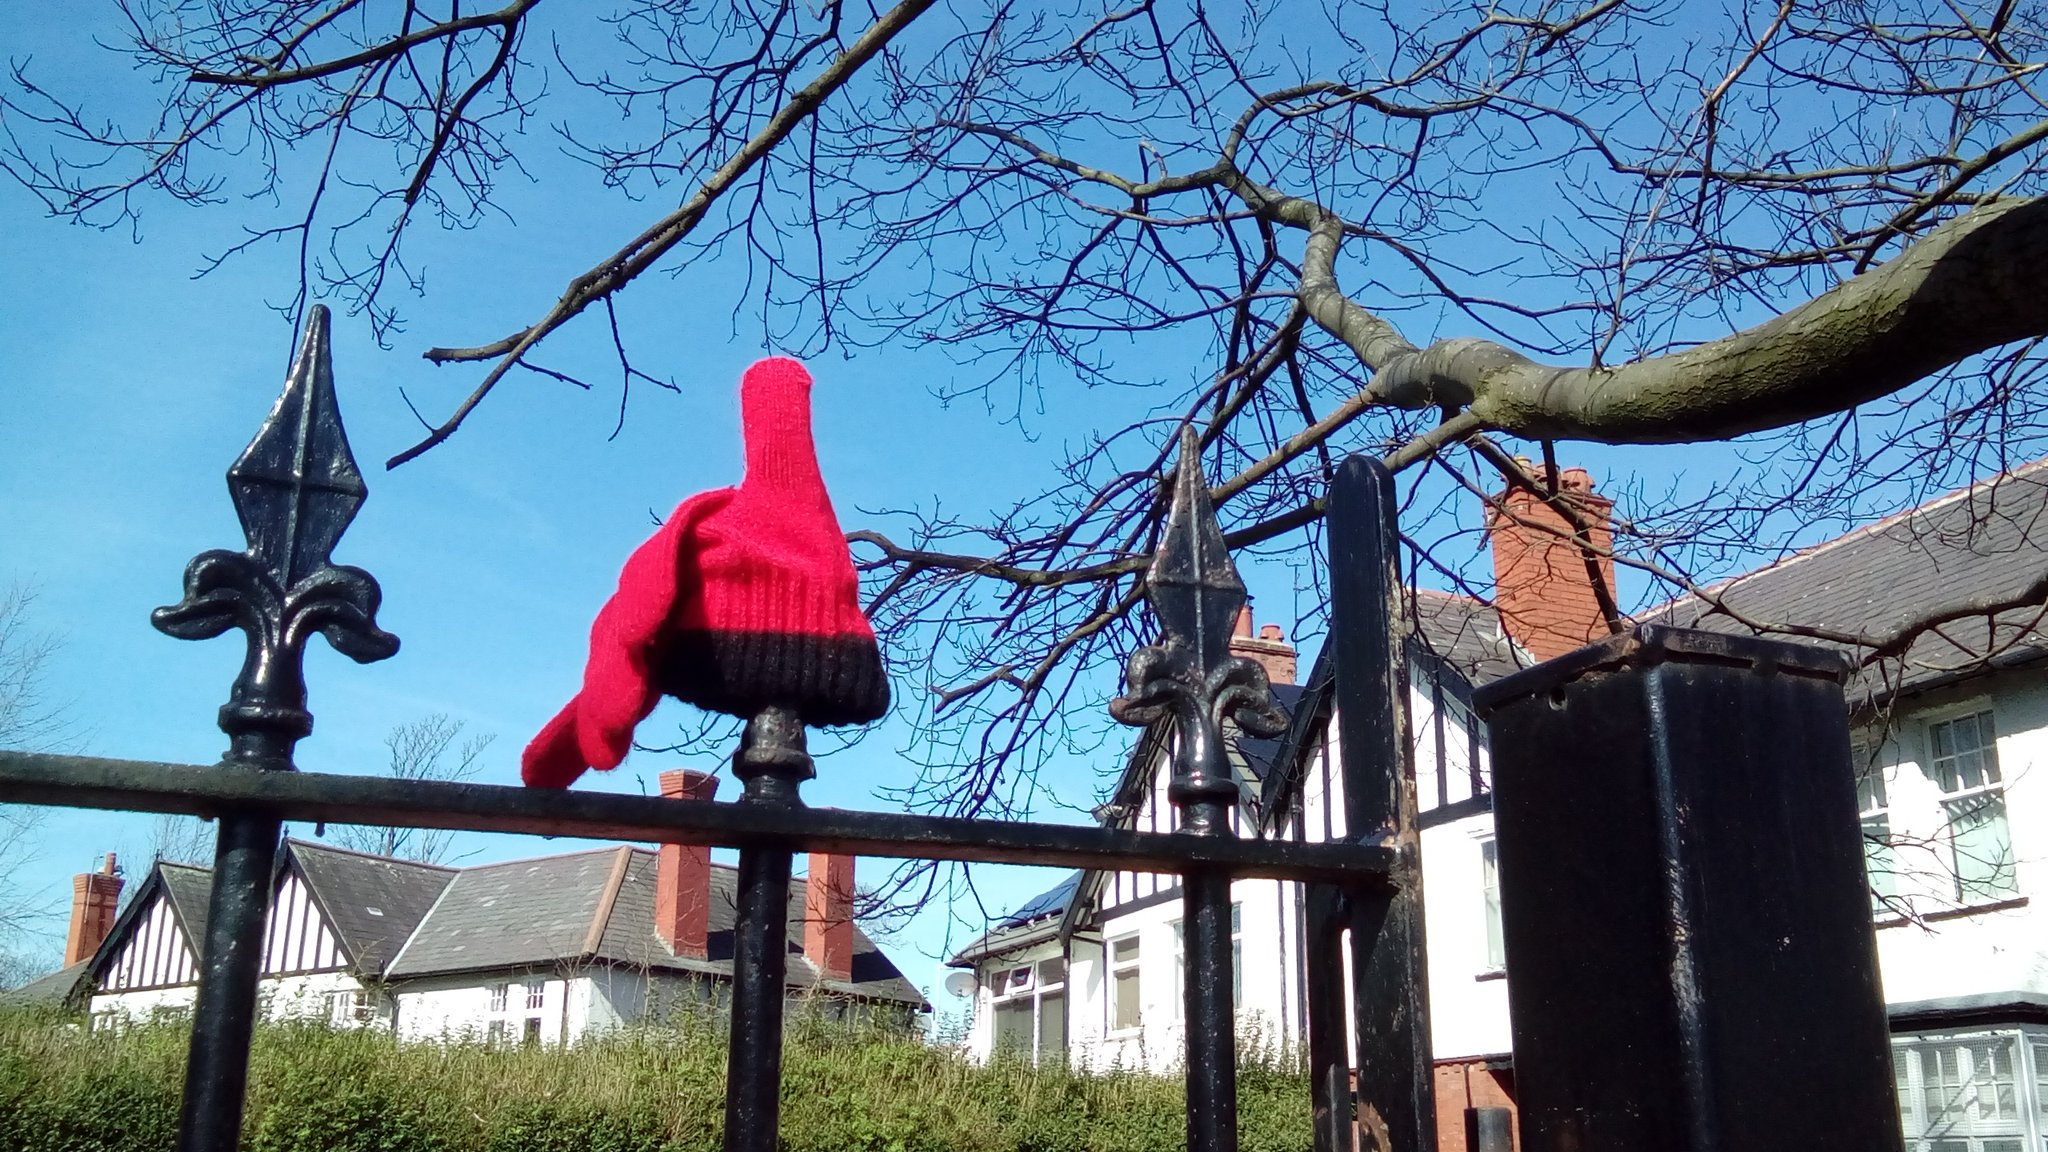 RT @digbydavies: Glove up Birkenhead Park @almurray https://t.co/GuDGYhBKbo